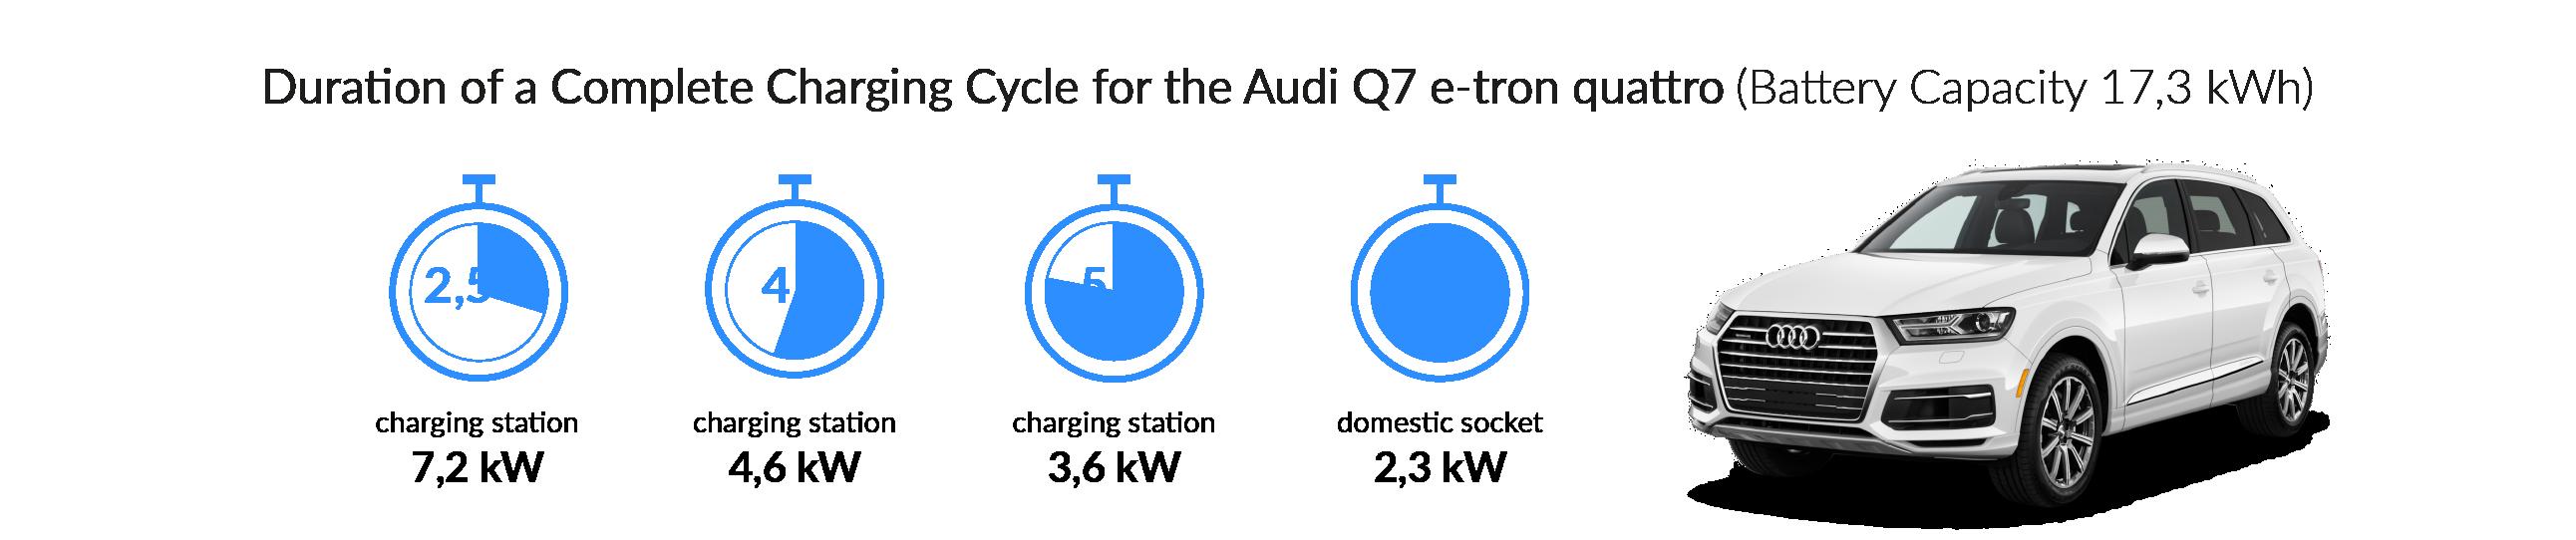 Charging time for the Audi Q7 e-tron quattro